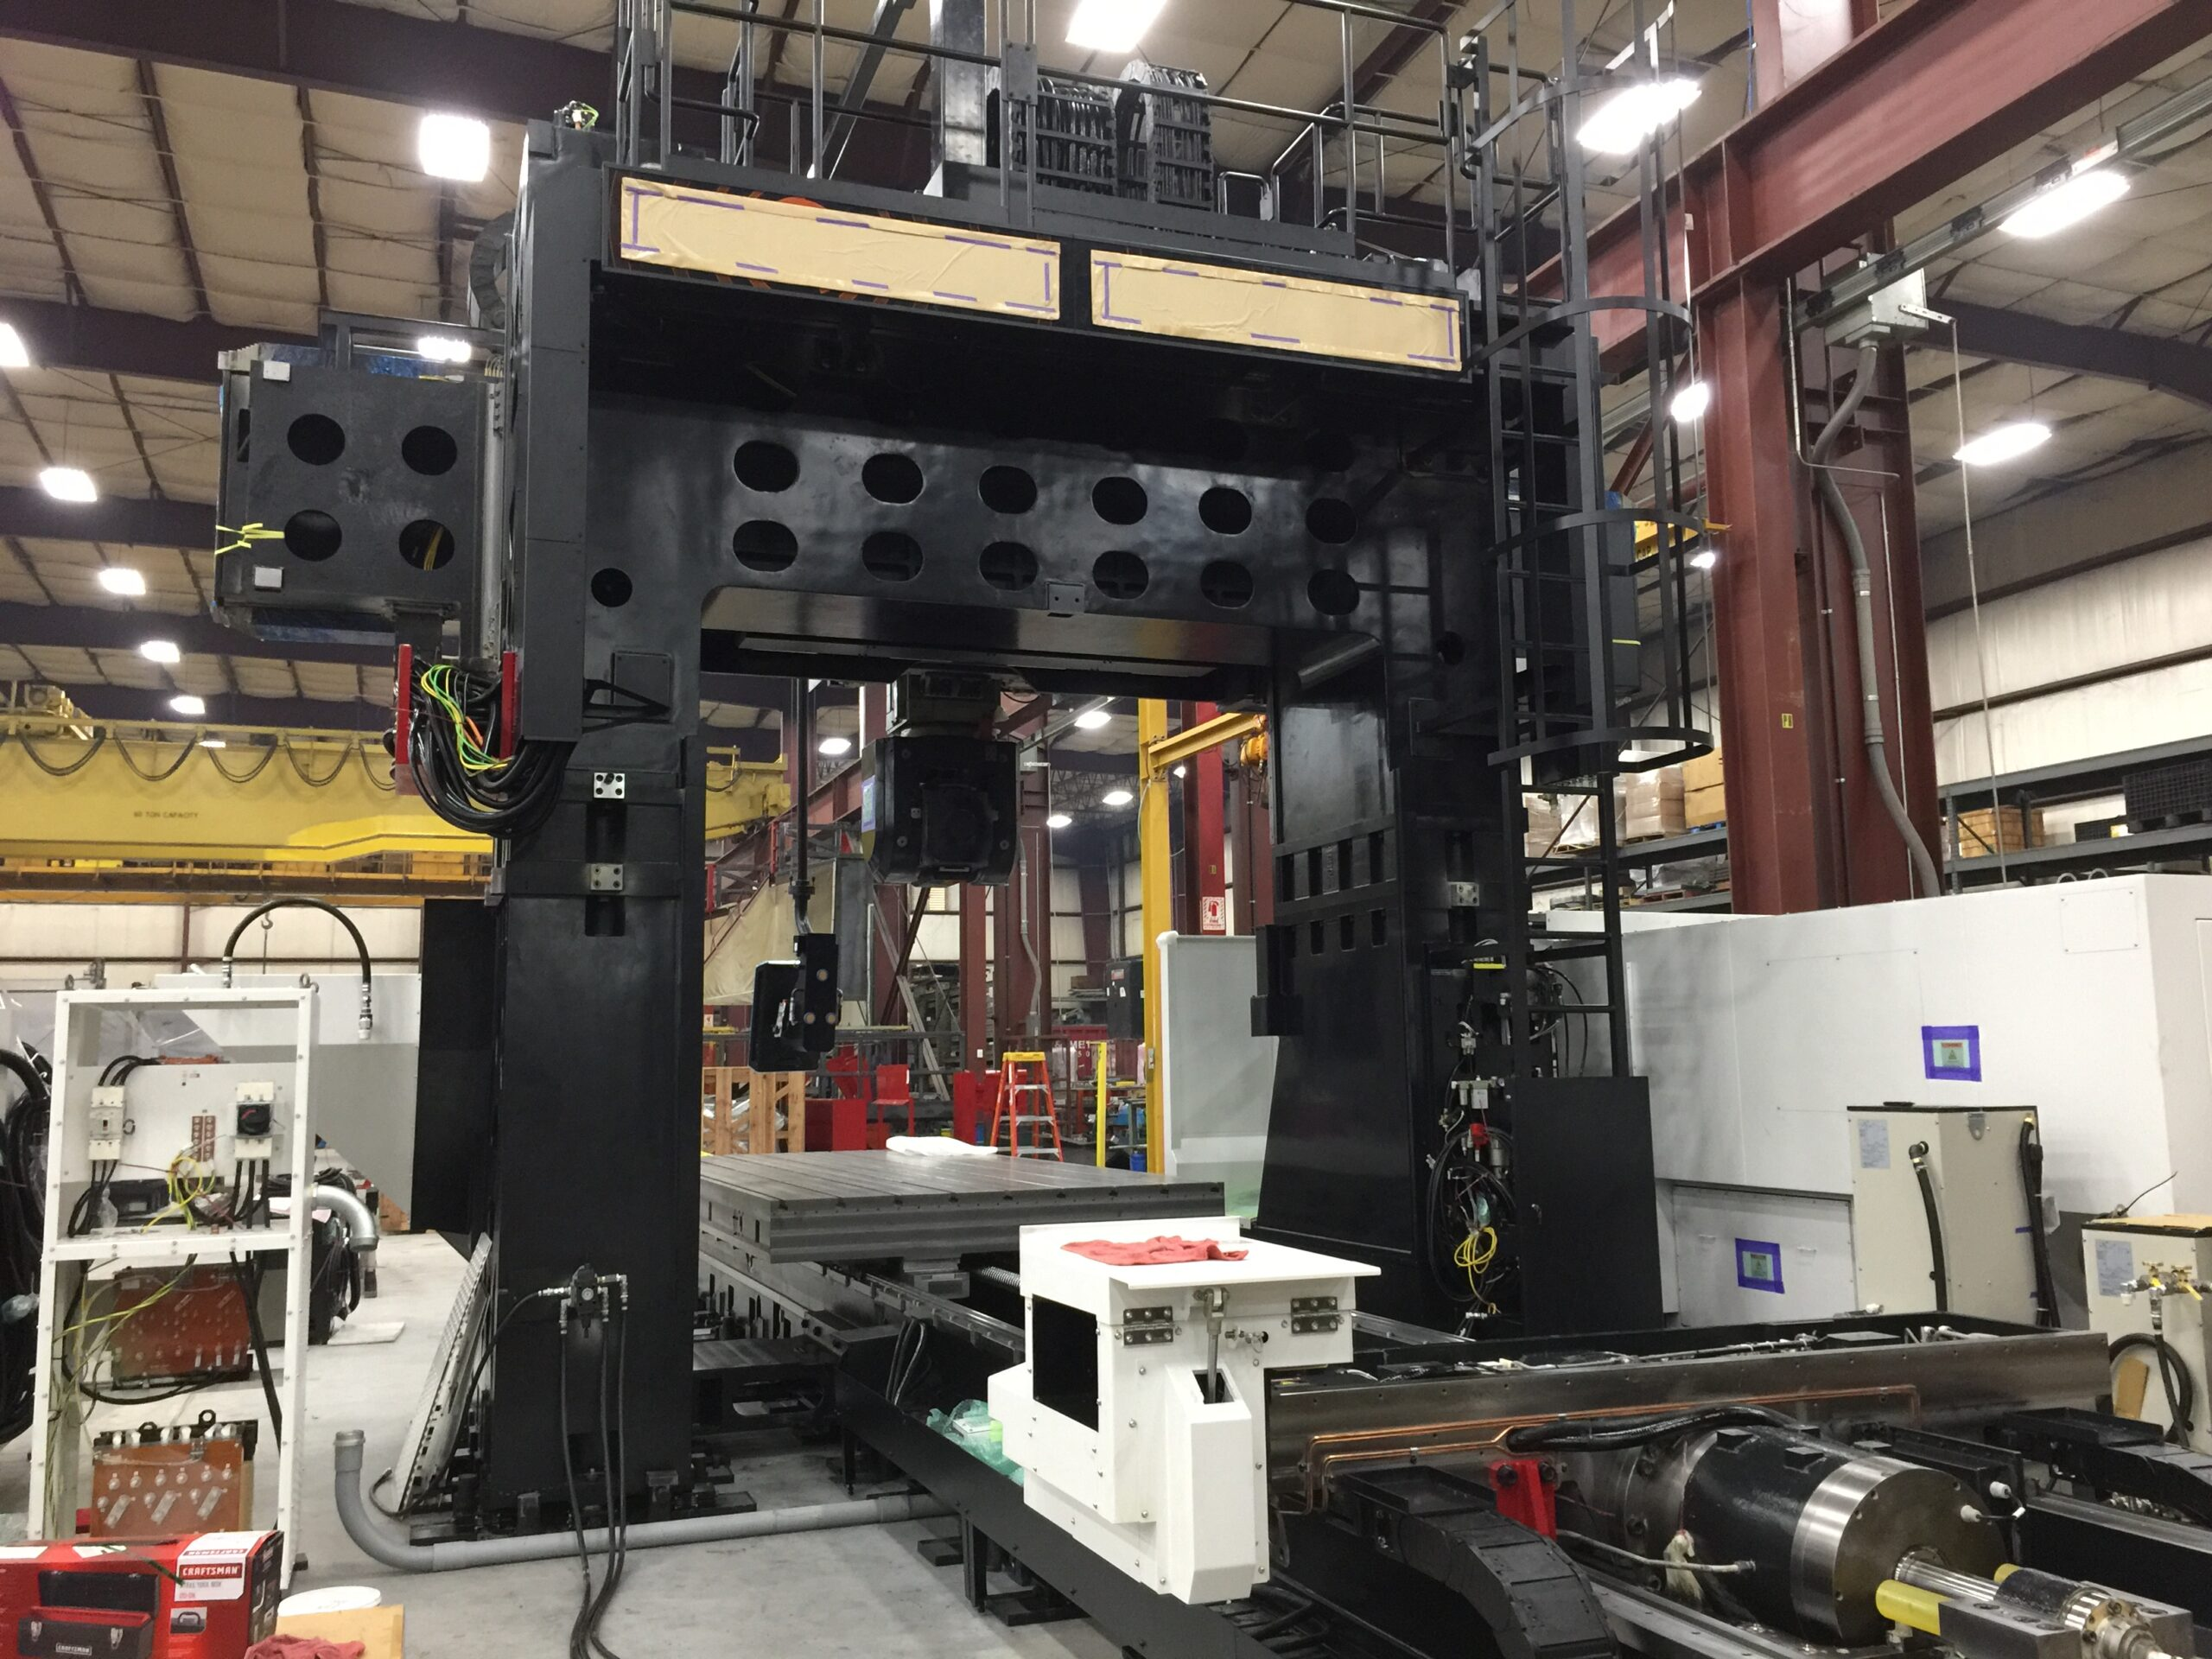 Large Mazak Milling Machine with 60,000 Lbs part capacity